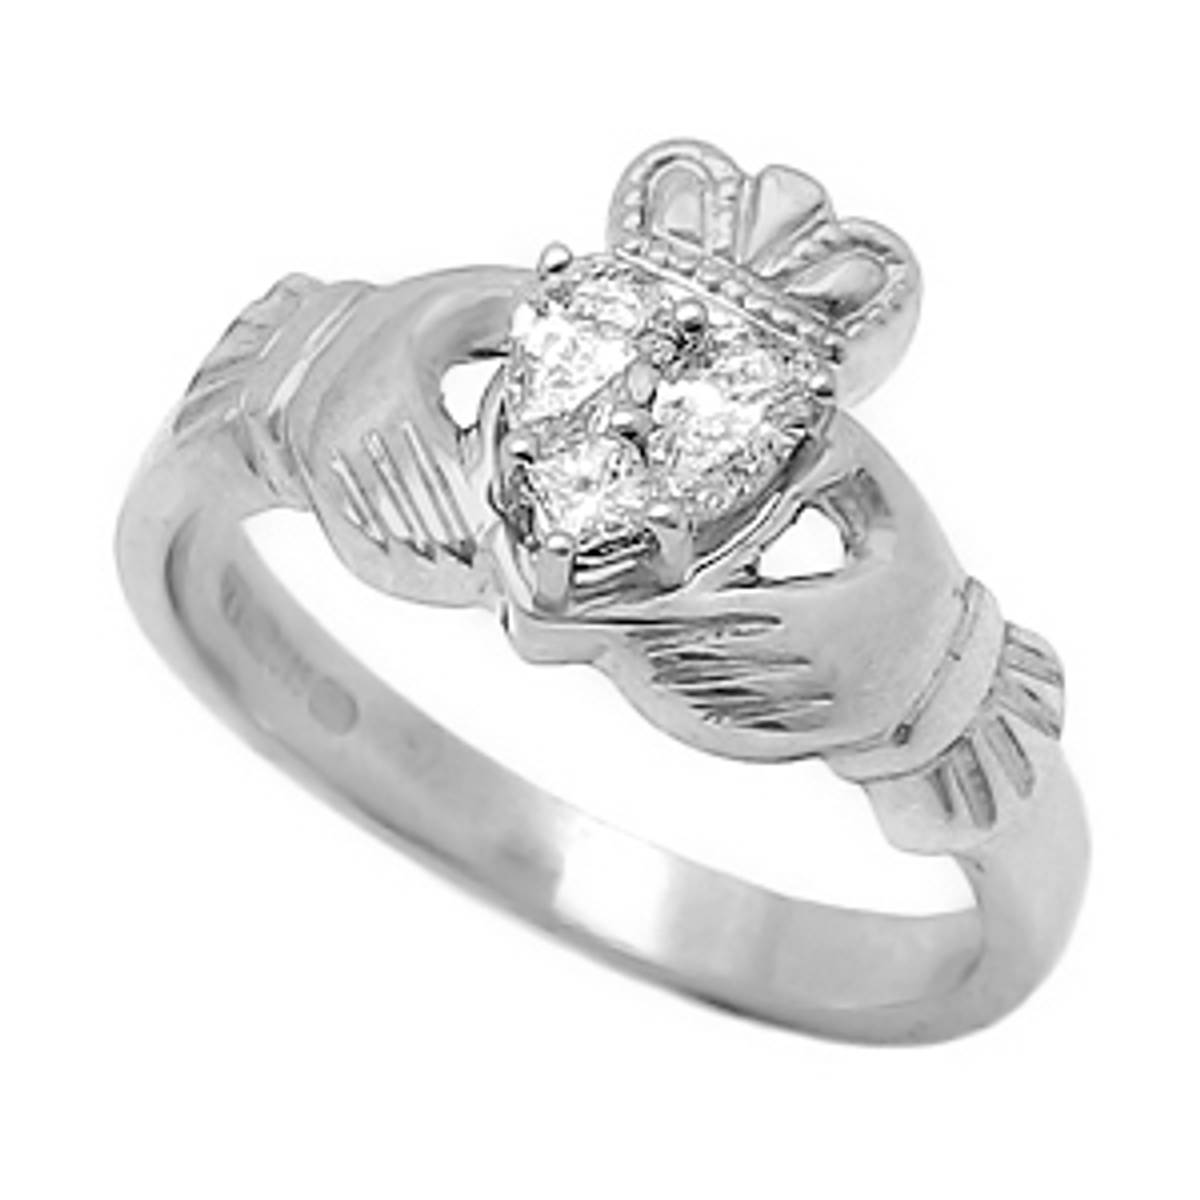 Irish made14 carat white gold 0.22cts/0.04cts diamonds claddagh engagement ring